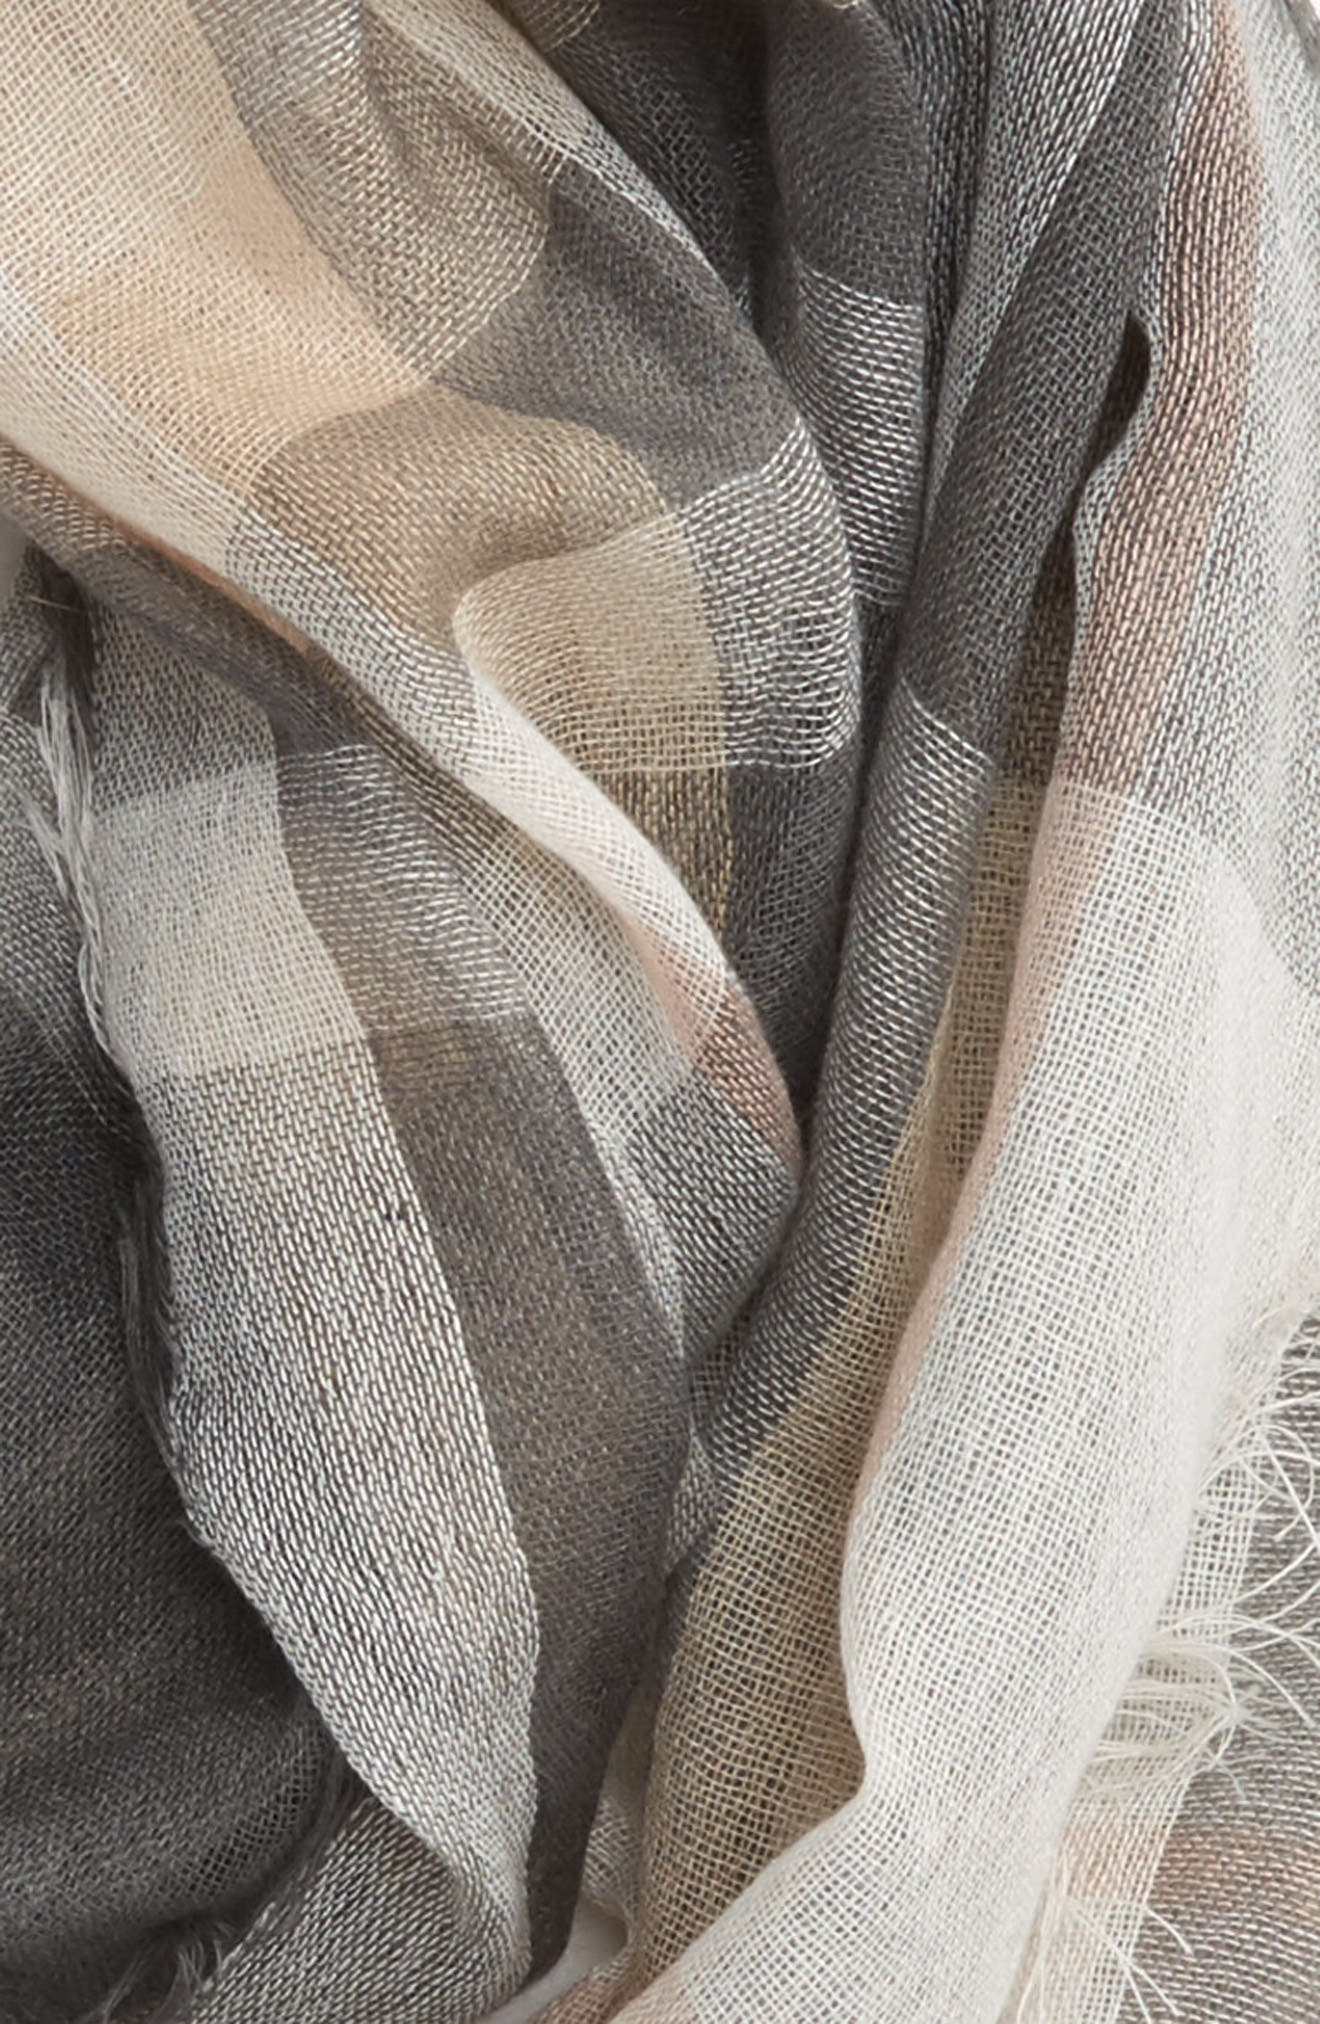 Plaid Infinity Scarf,                             Alternate thumbnail 3, color,                             Grey Multi